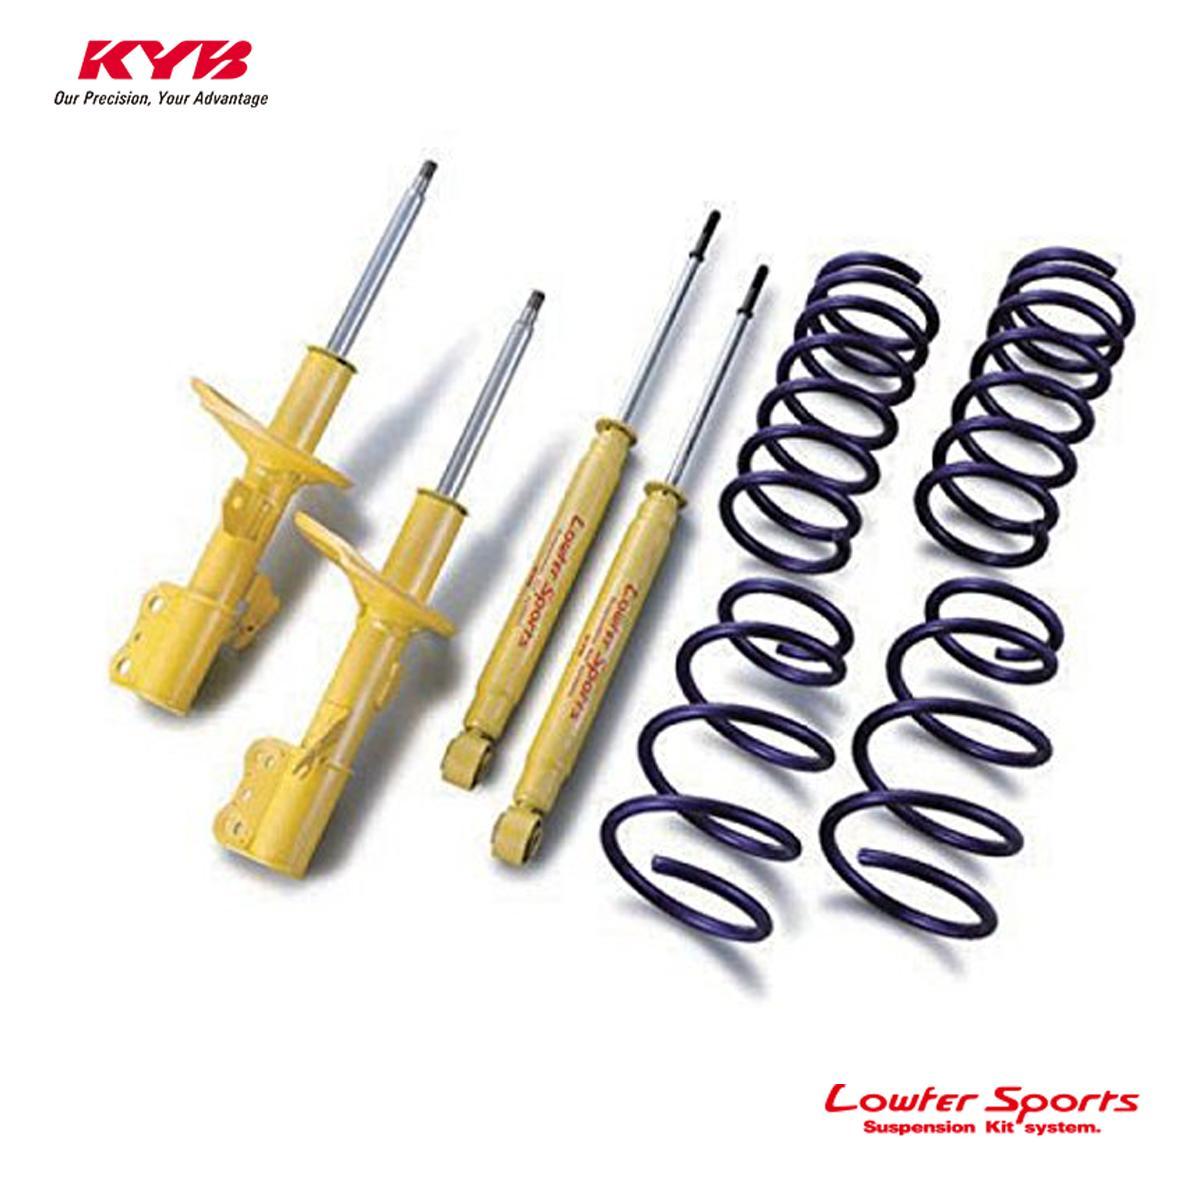 KYB カヤバ ギャランフォルティス CY4A ショックアブソーバー サスペンションキット Lowfer Sports LKIT-CY4A 配送先条件有り